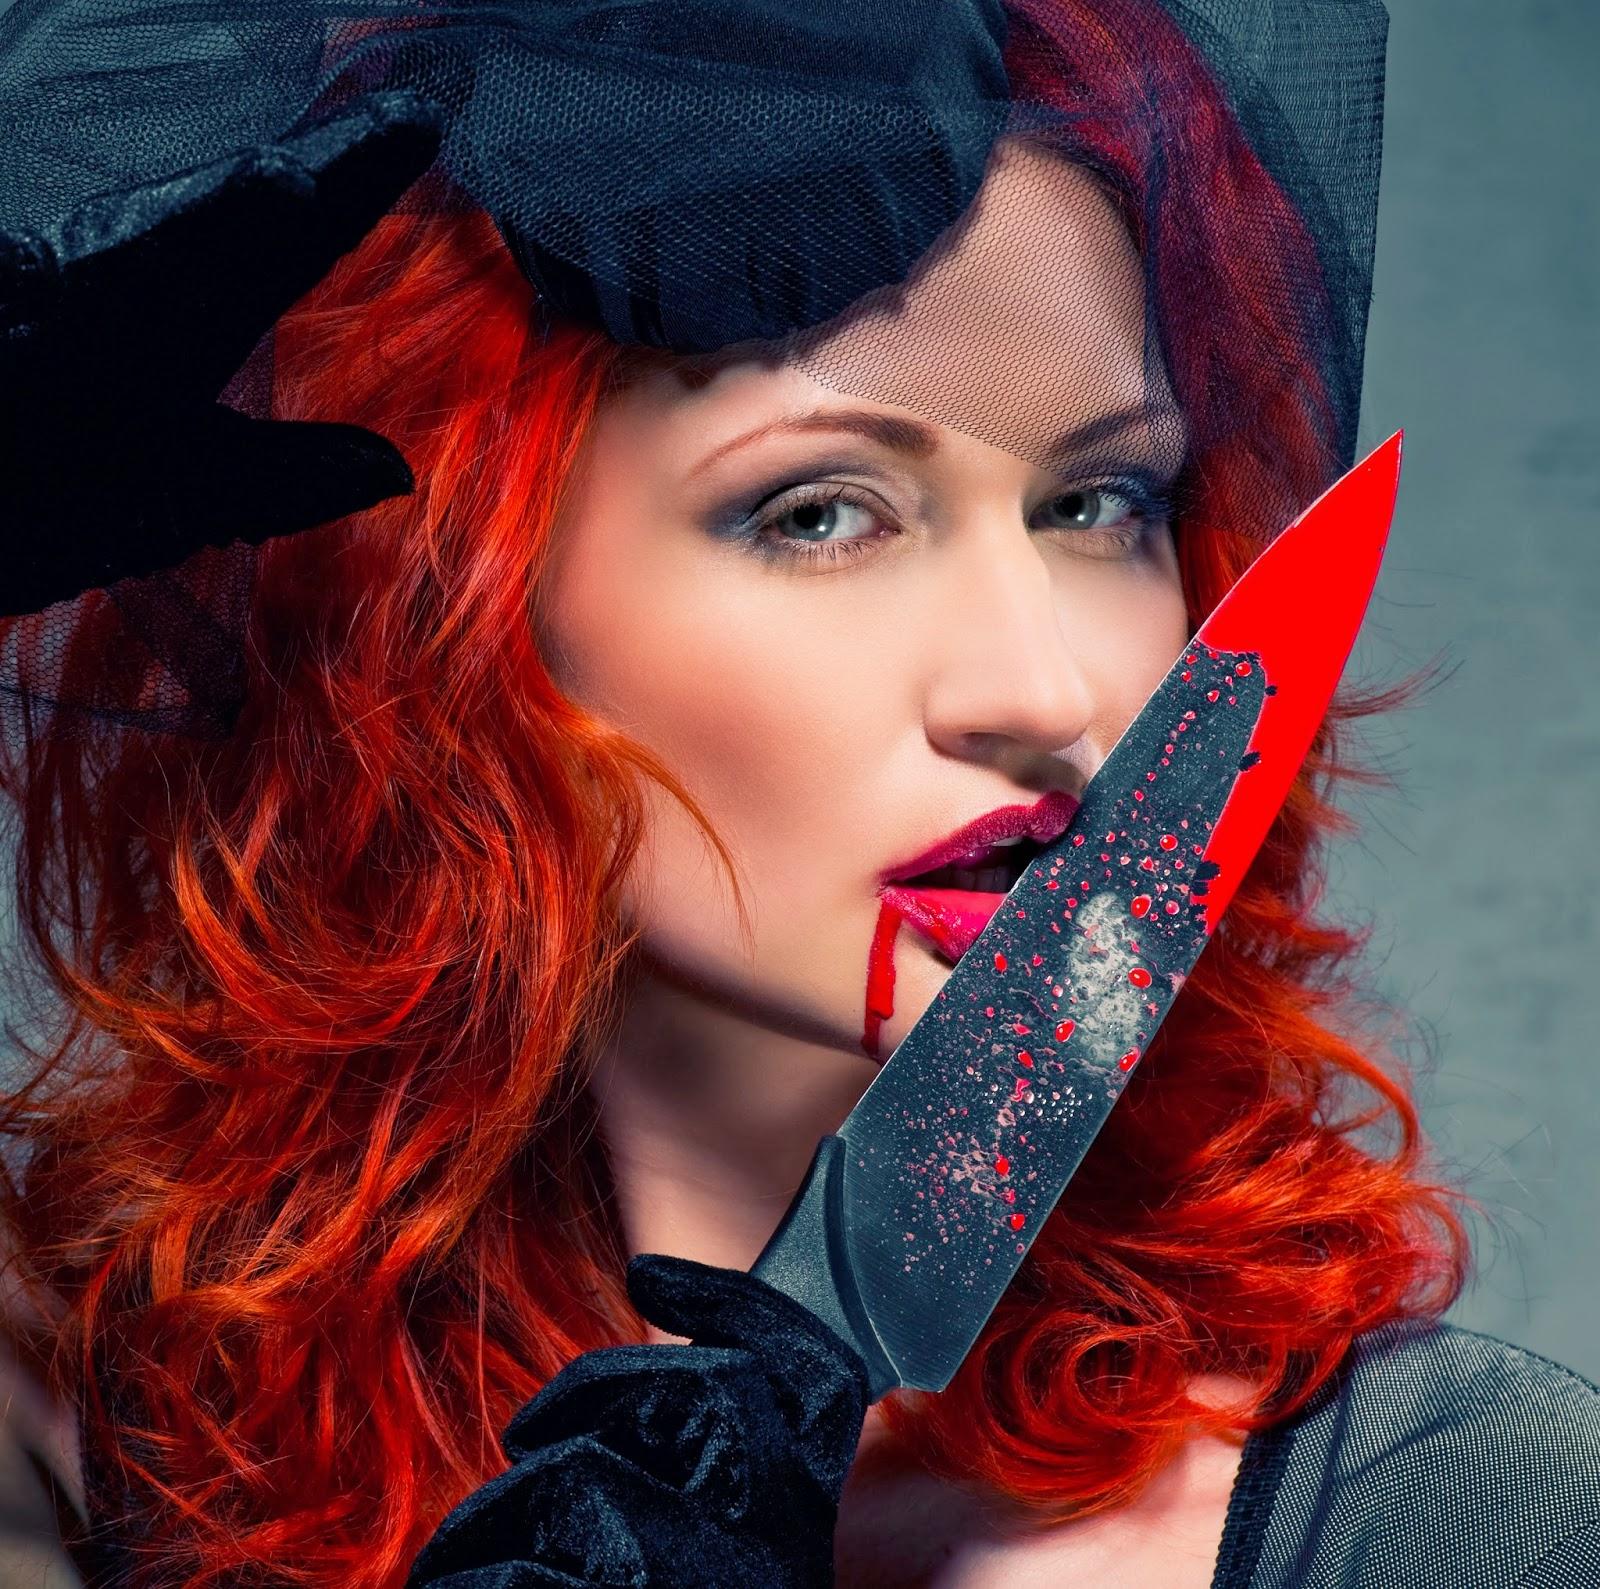 Halloween Ideas Blog: Hd Wallpapers Blog: Halloween Costumes 2013 Ideas